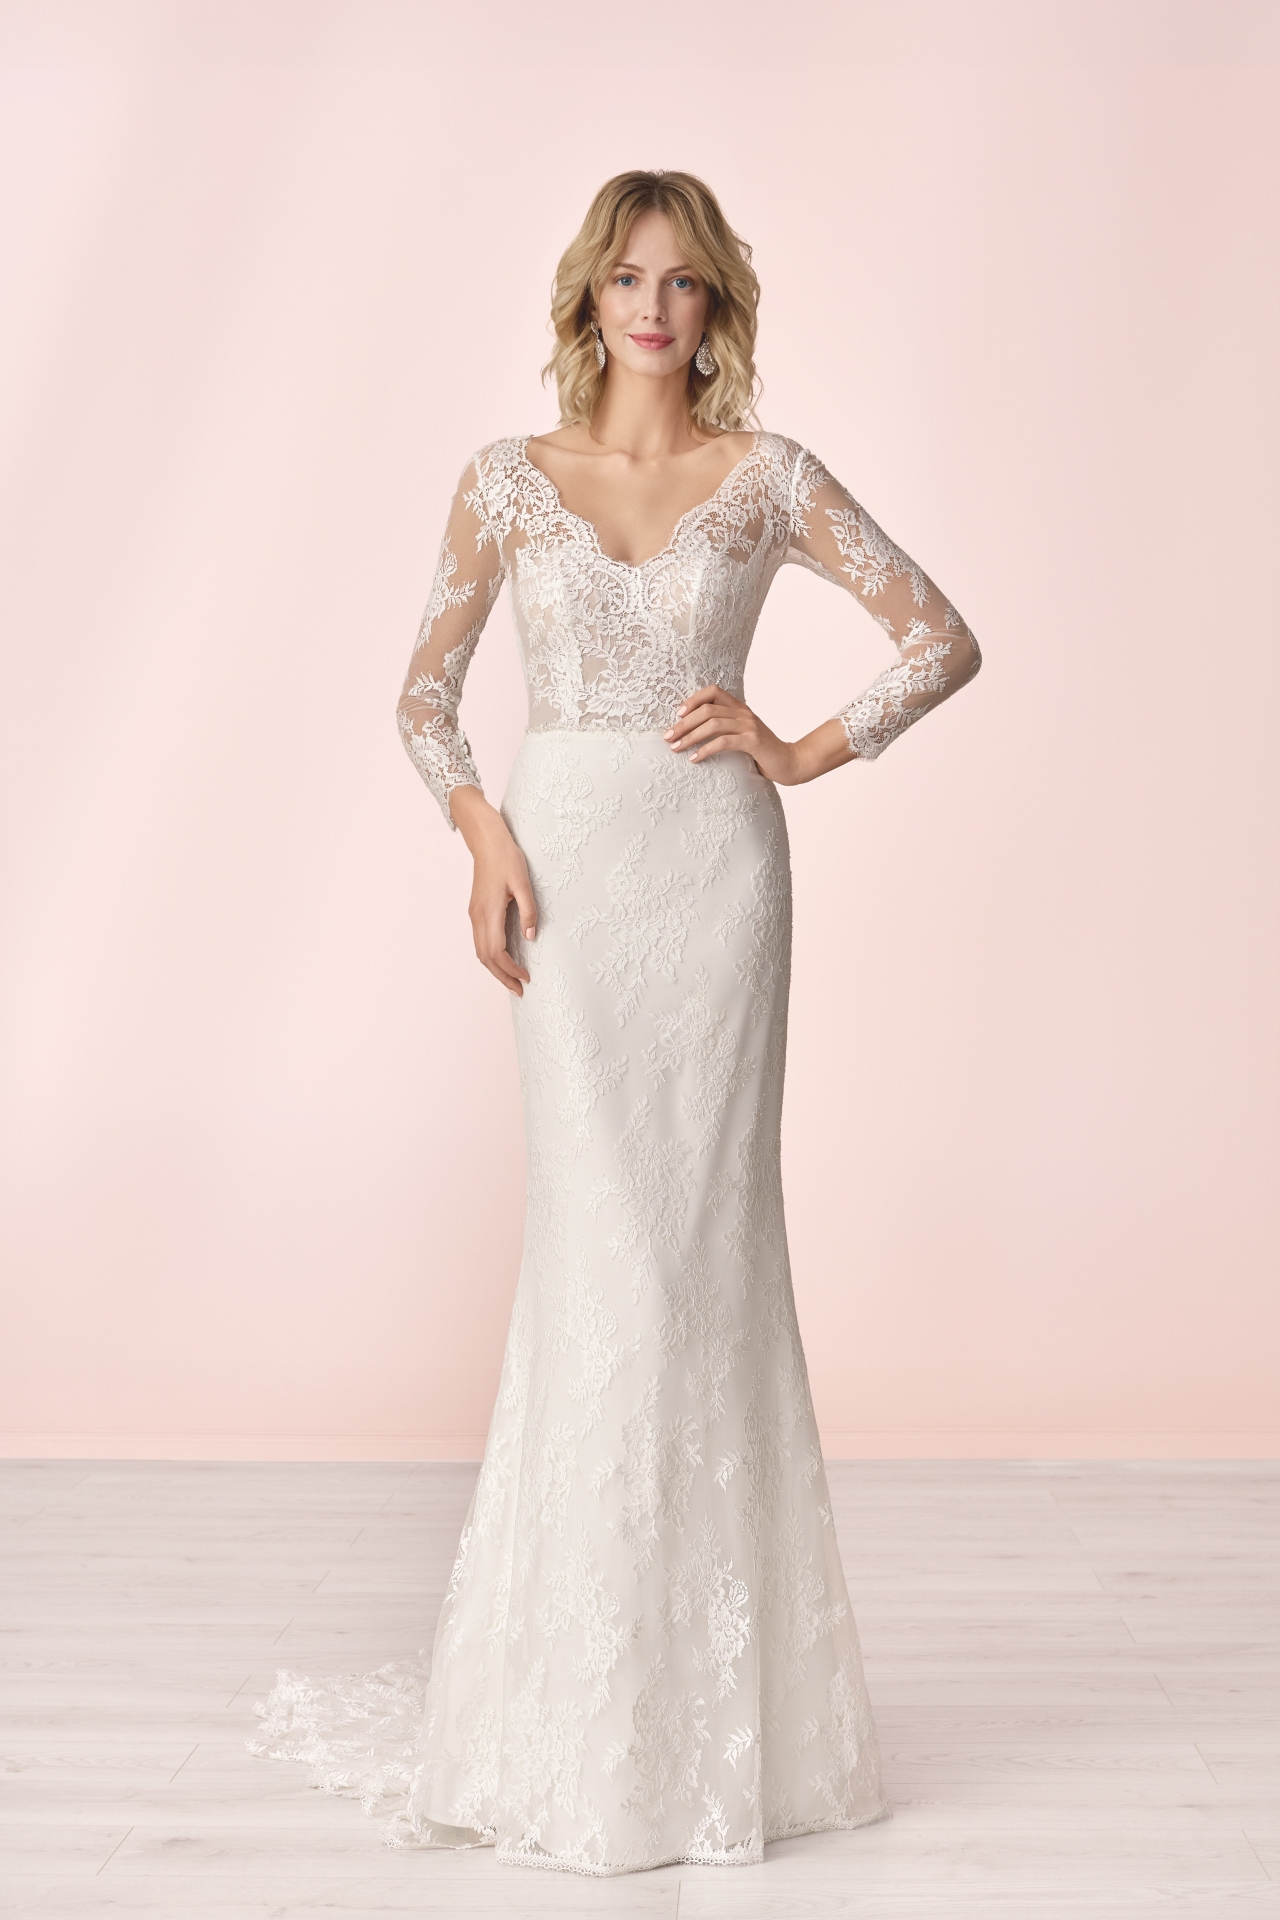 Brautkleid Elizabeth Konin 2019 - 4093T-1